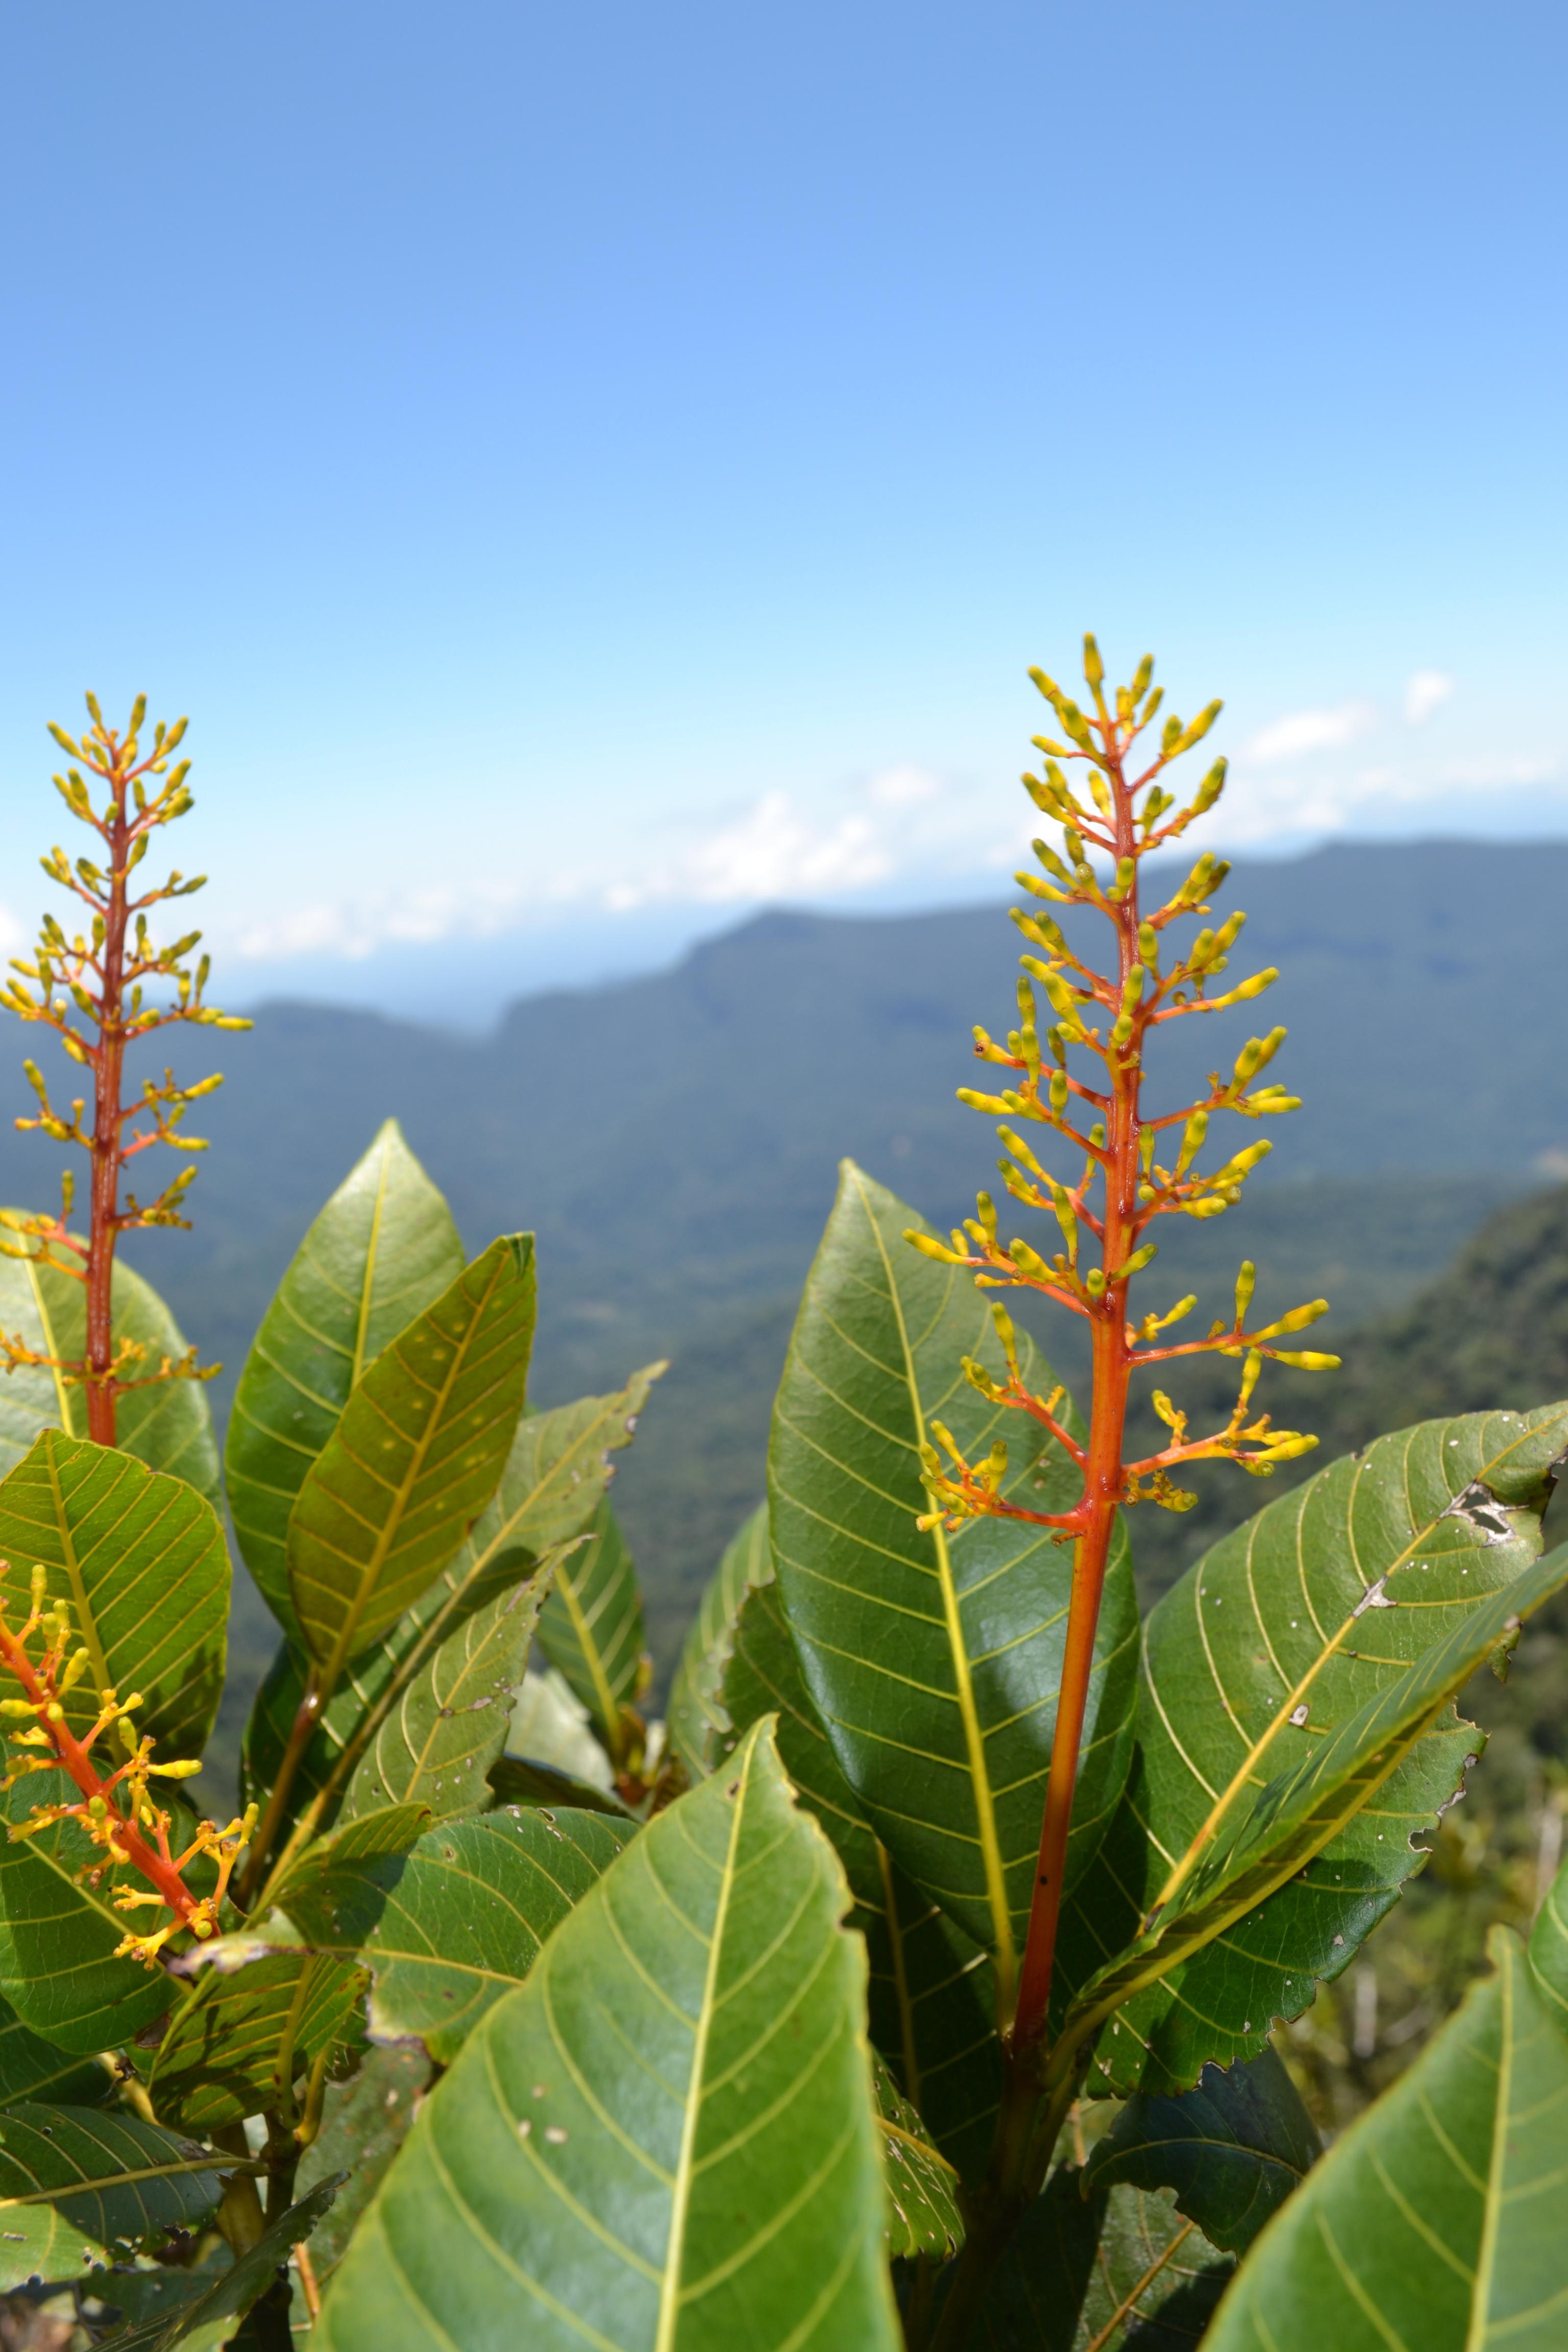 Specimen: Palicourea hollinensis